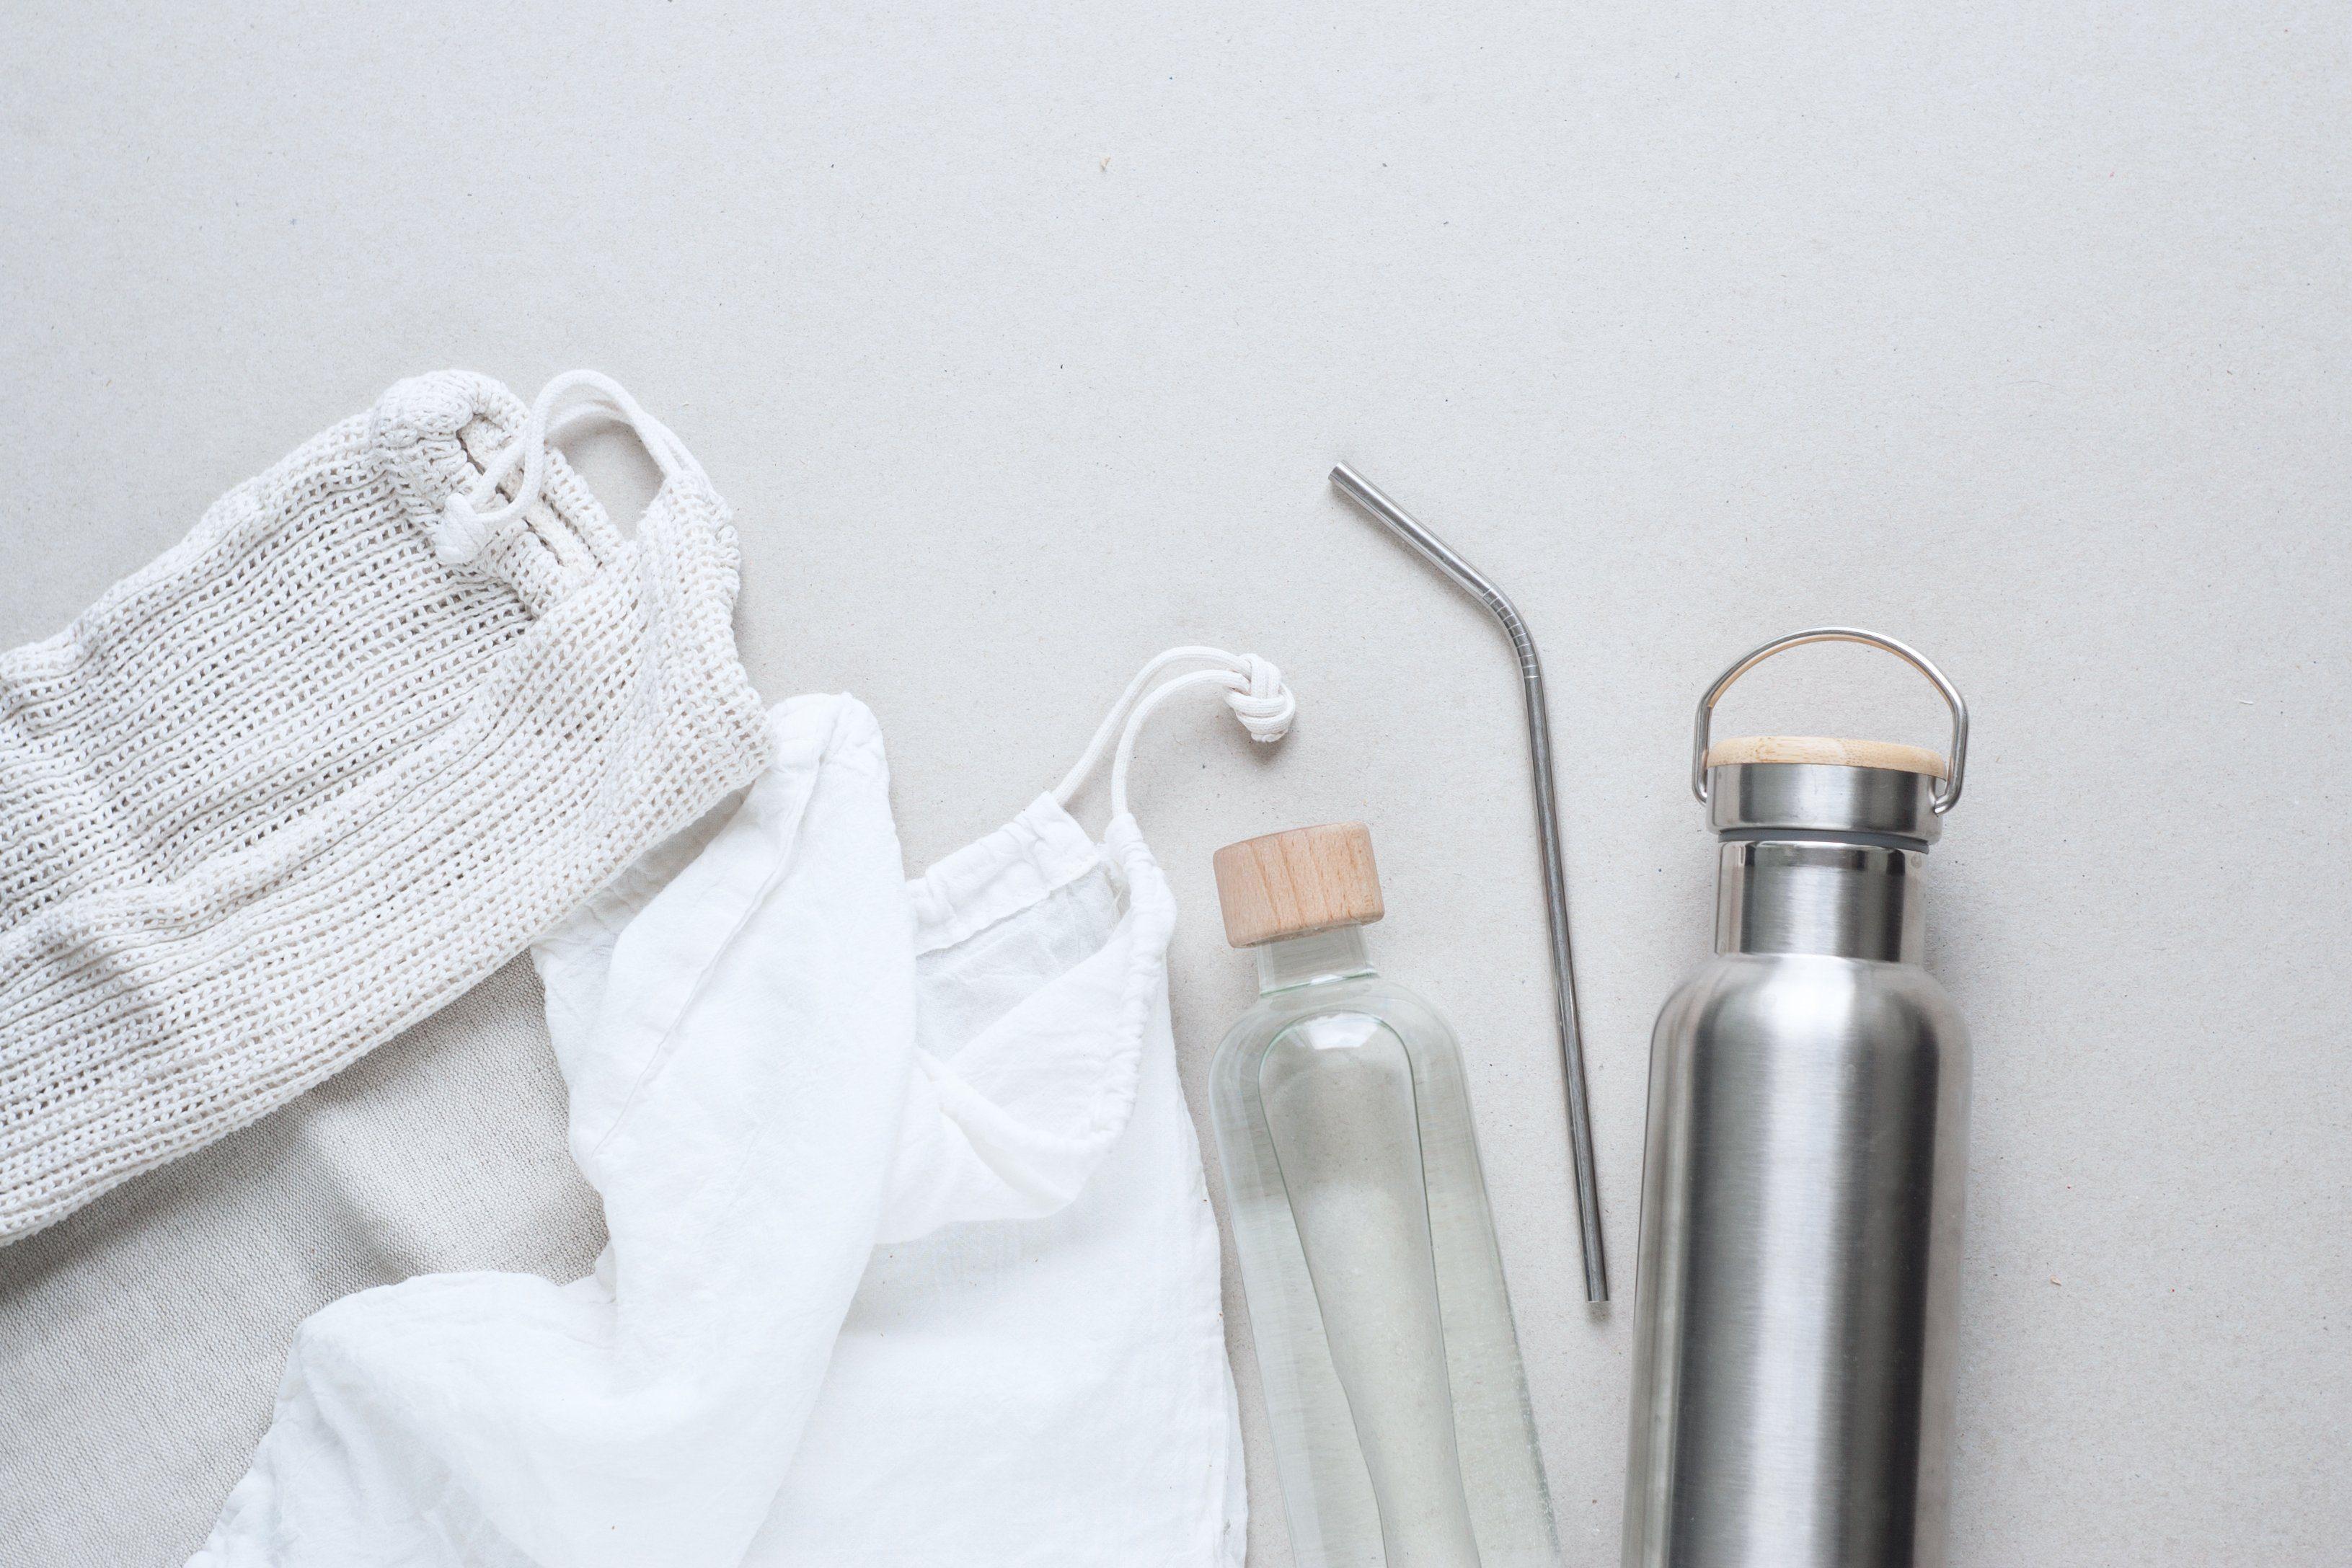 Zero Waste Starter Kit for shopping, Minimalism; Shutterstock ID 1141506737; Job (TFH, TOH, RD, BNB, CWM, CM): RD